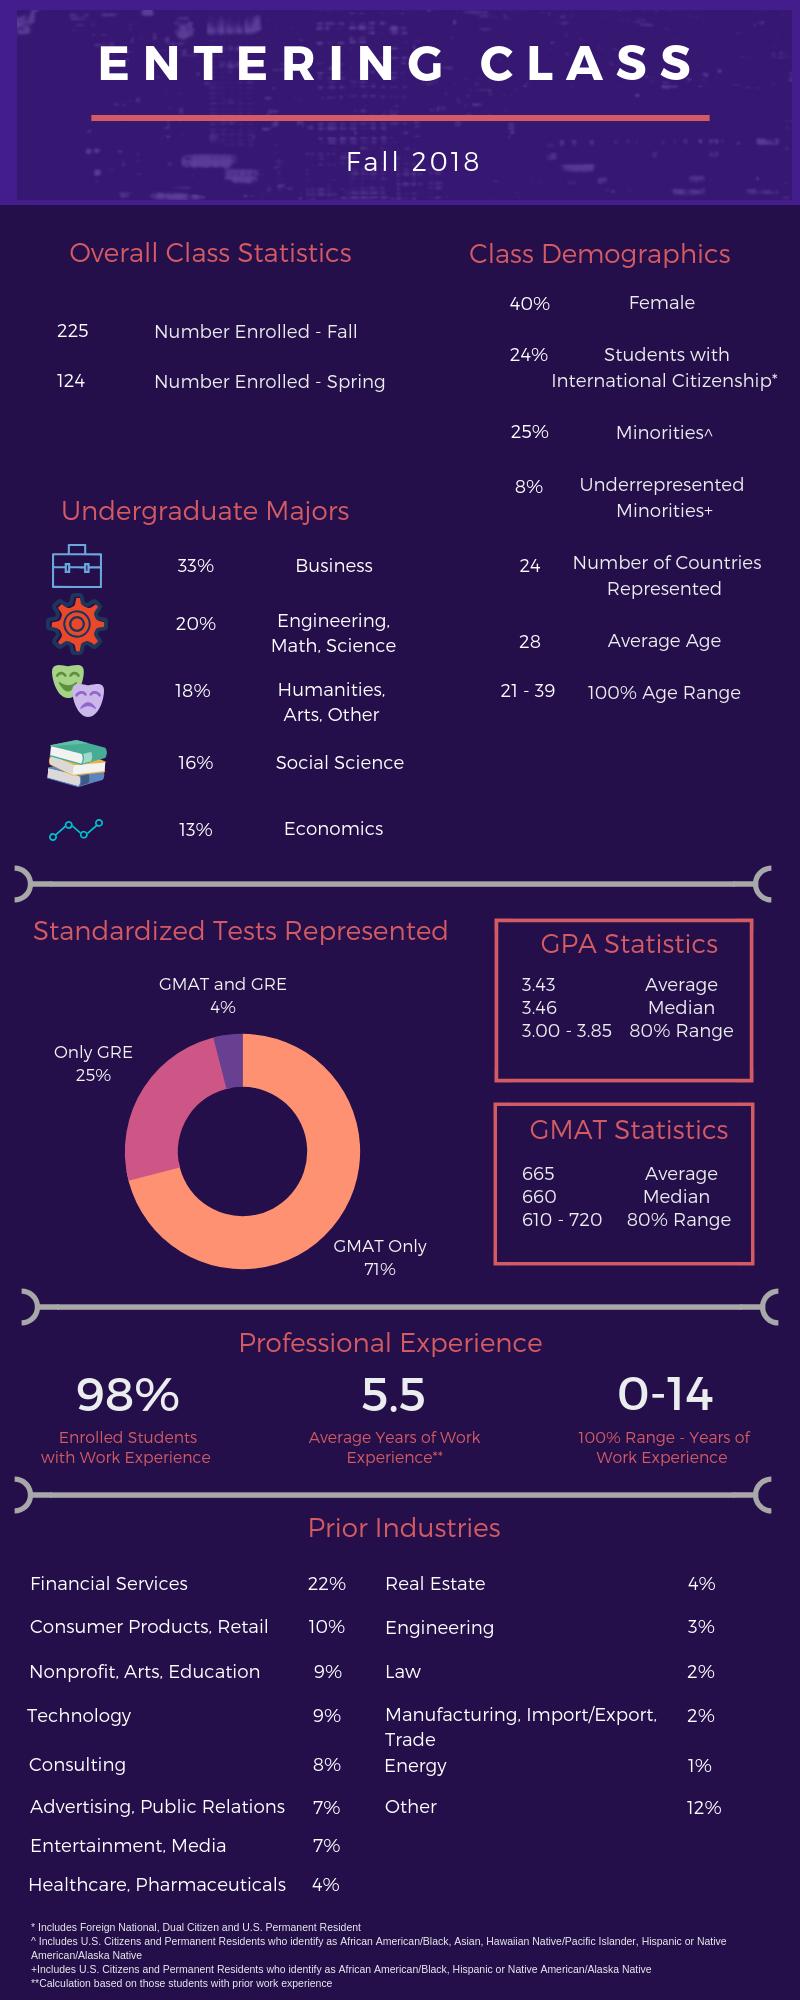 Fall 2018 Class Profile